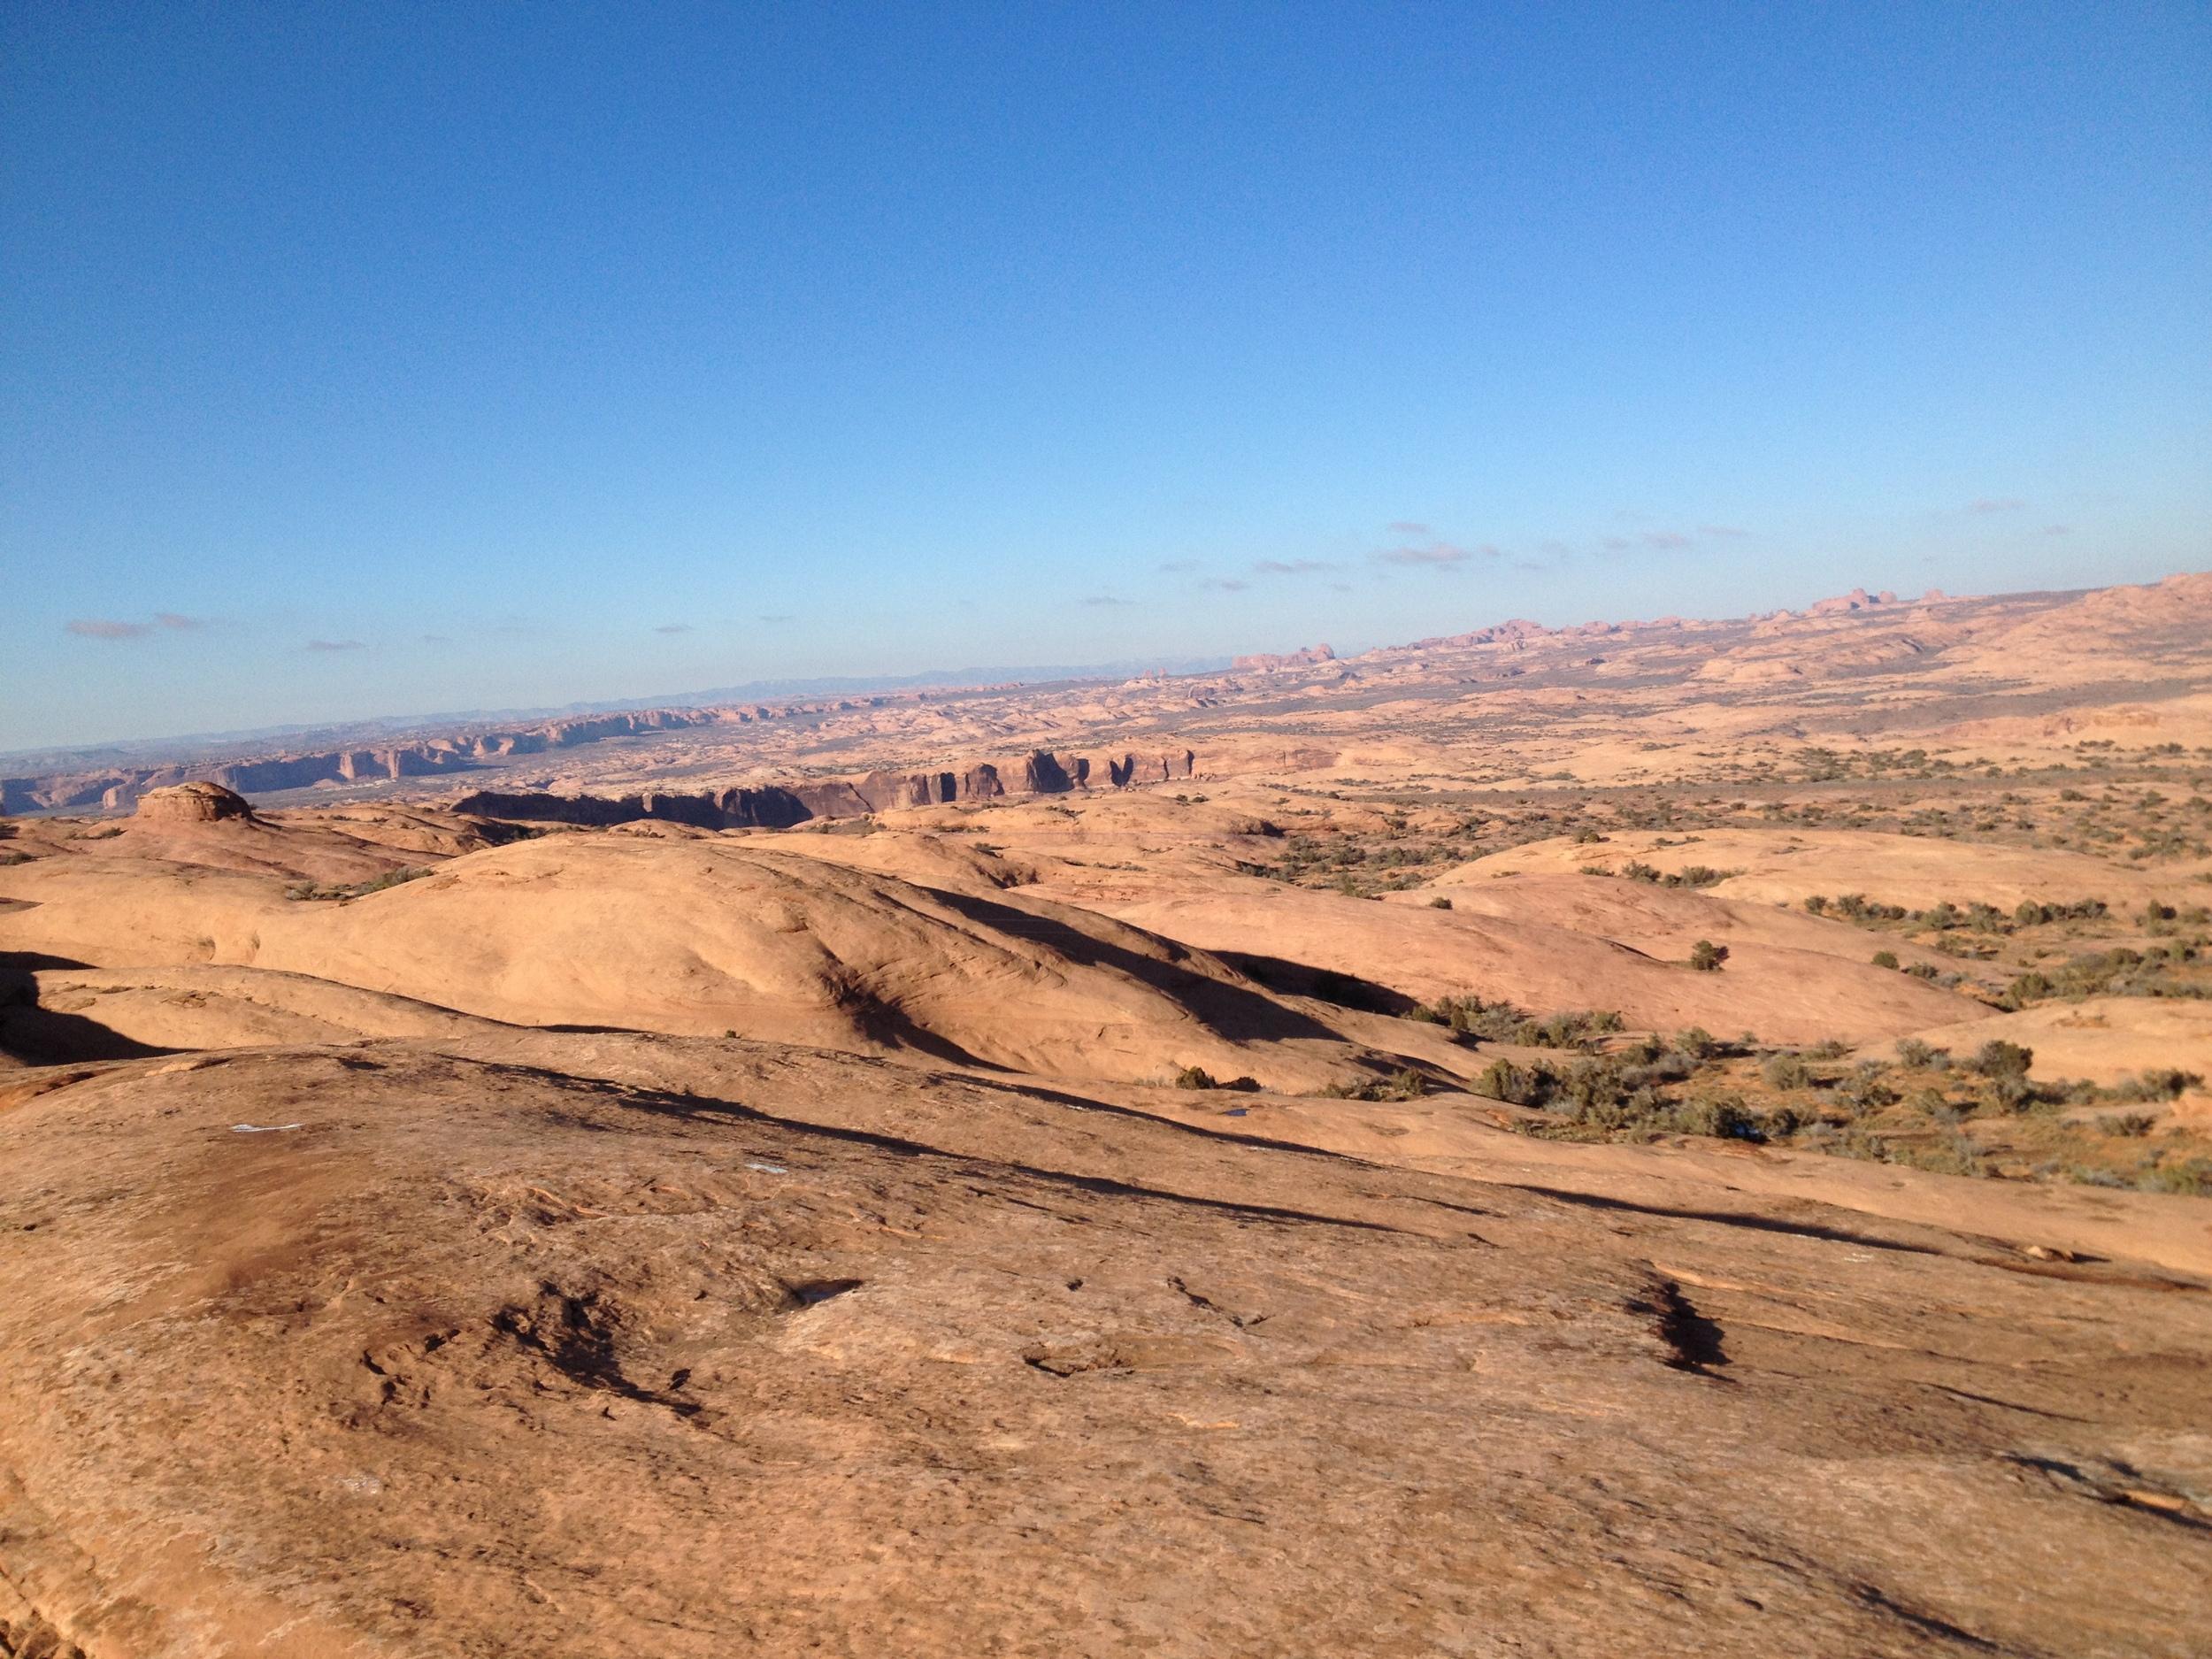 Photo credit: Tom Birks, Slickrock Trail, Moab, UT, 11/2013